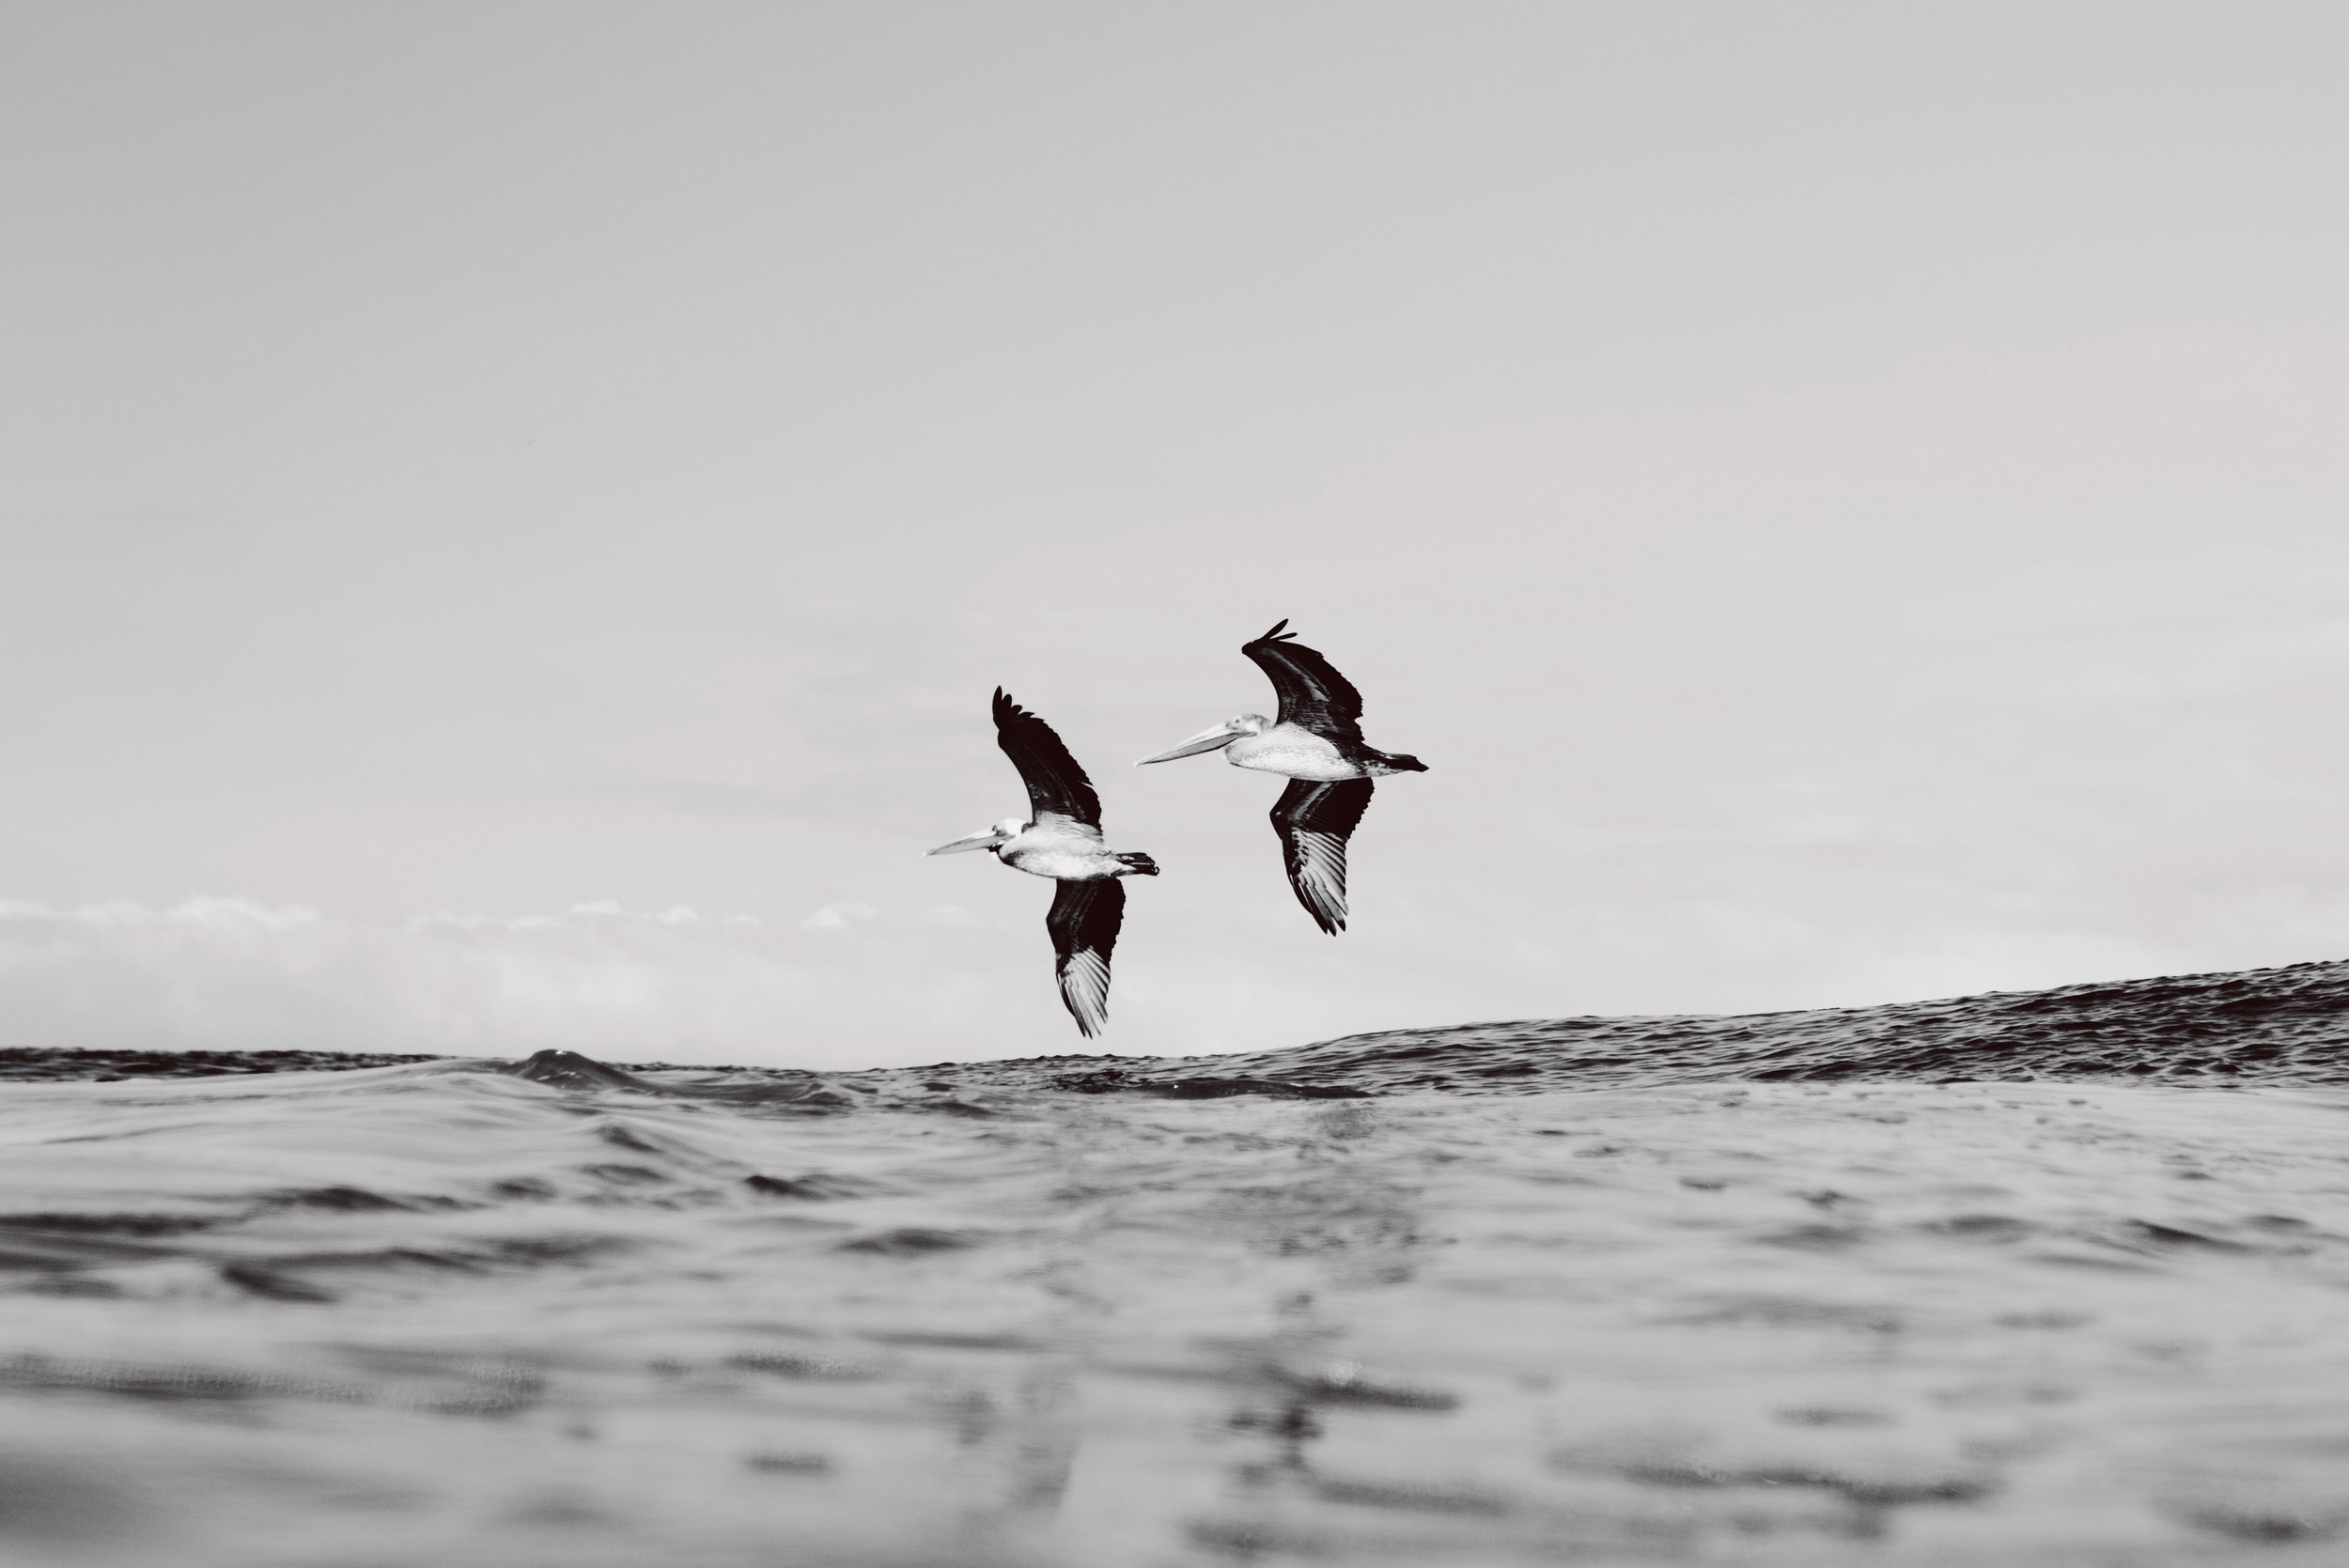 Sayulita-Mexico-Surf-Diego-Cadena-Kalle-Carranza-Dylan-Southworth-Gato-Rodriguez-Julien-Dorian-Gomez-Heiko-Bothe-12.jpg